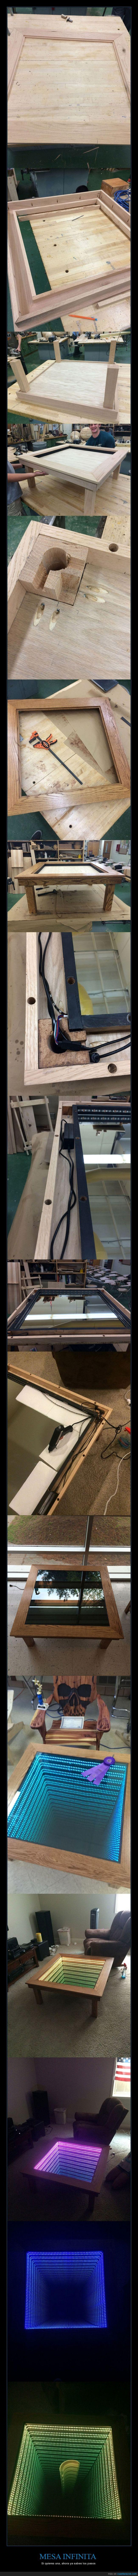 abajo,color,espejo,infinita,led,mesa,mueble,tira